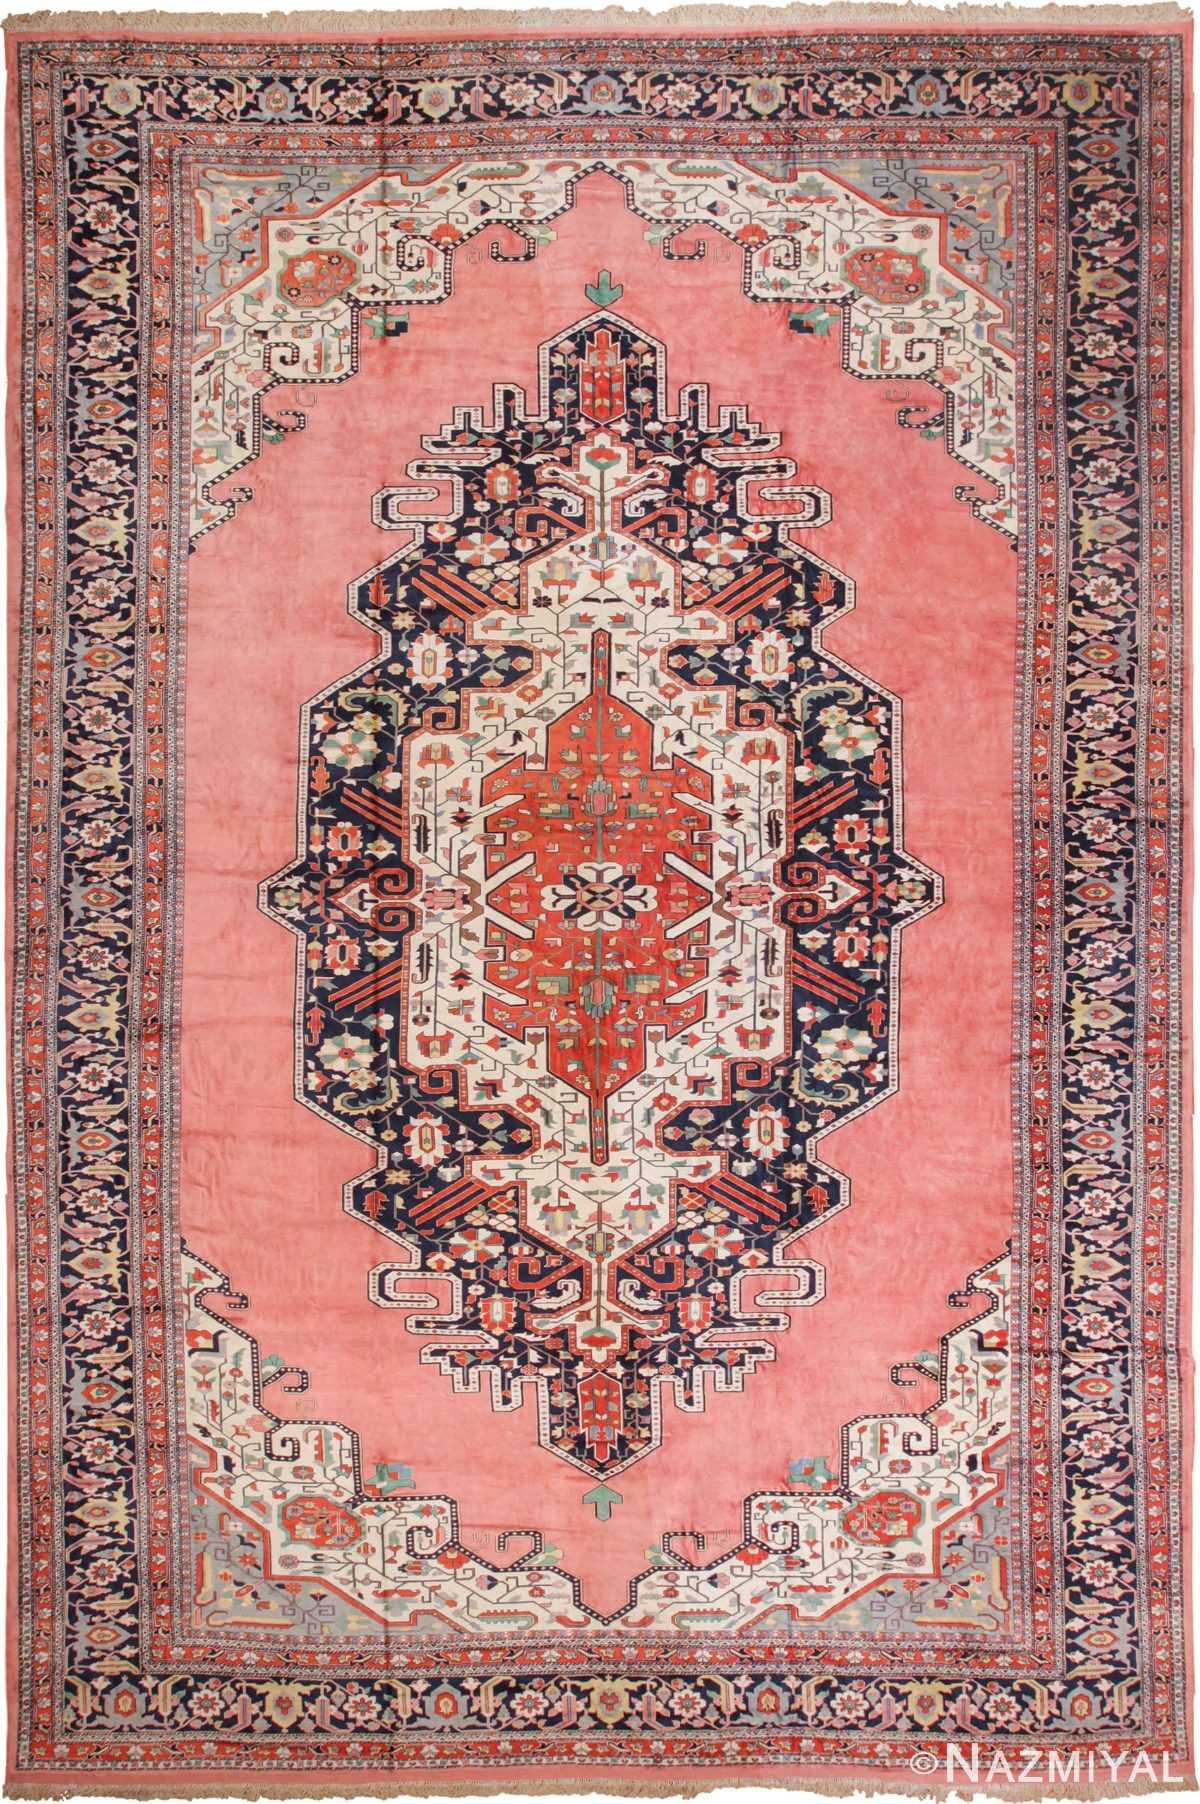 Large Luxurious Vintage Persian Silk Heriz Rug 60034 by Nazmiyal